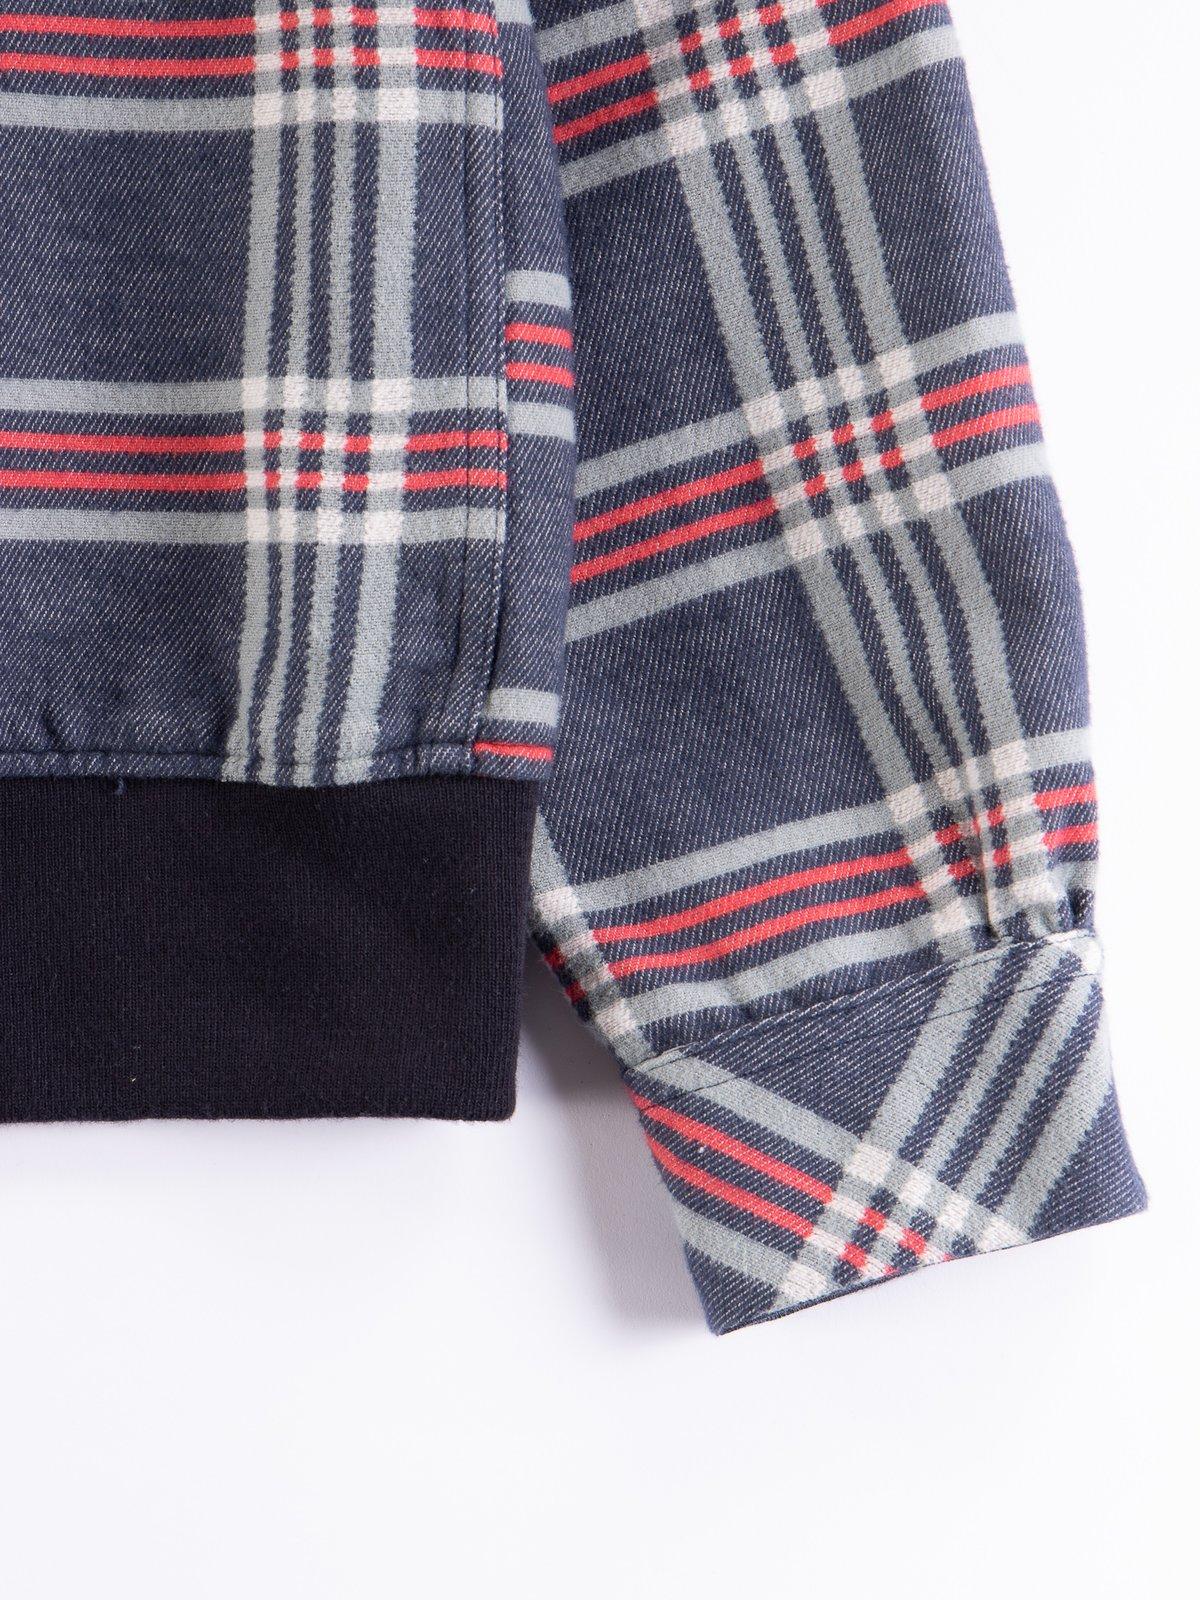 Navy/Teal/Red Big Plaid Classic Shirt - Image 4